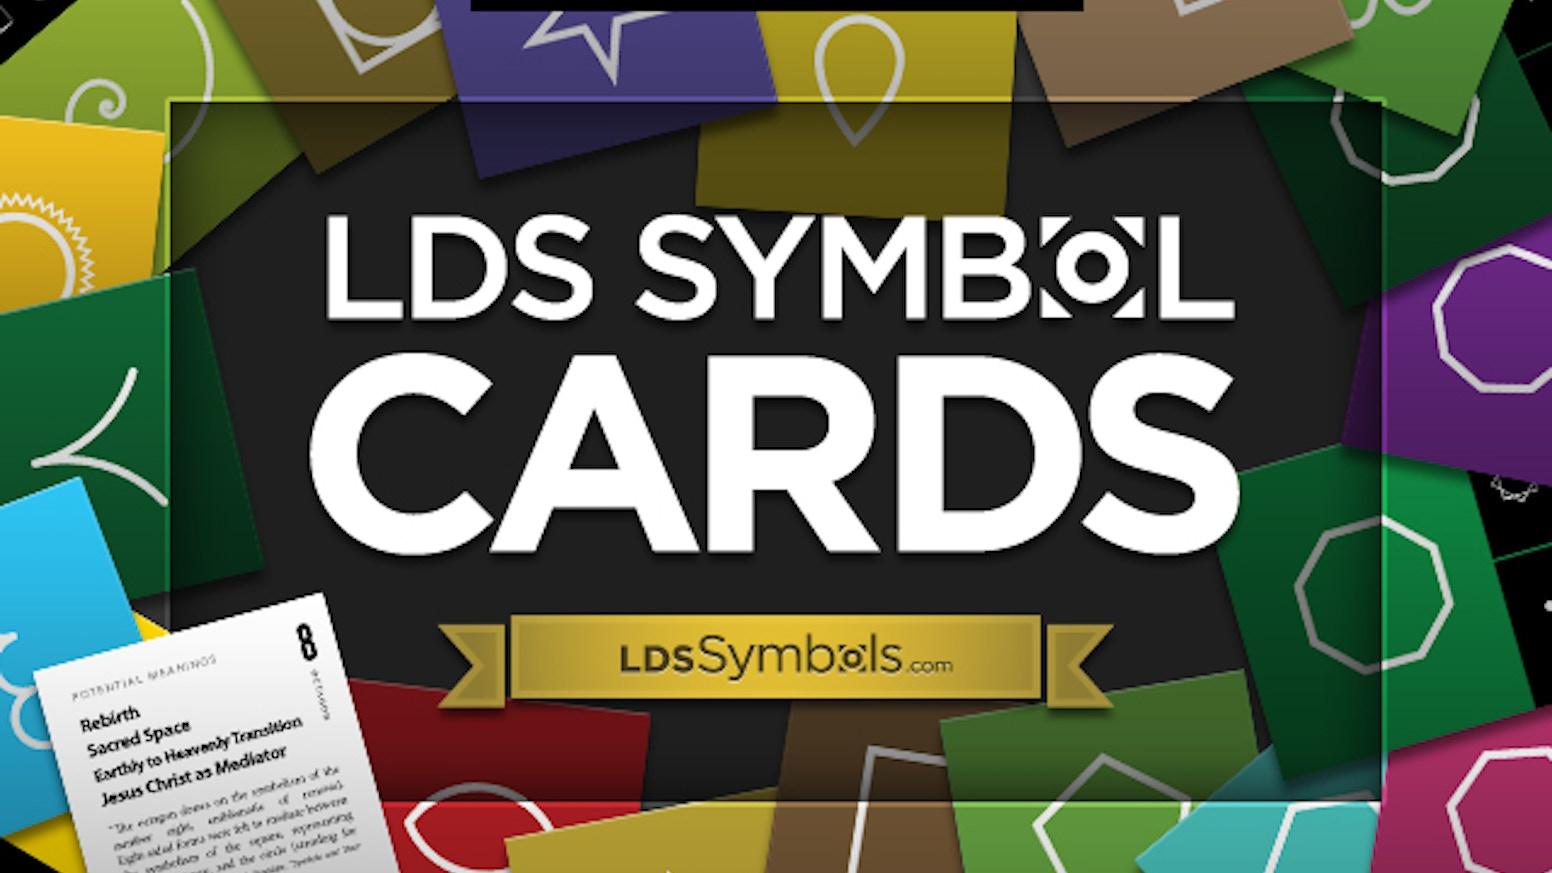 Lds symbolism cards by steve reed kickstarter lds symbolism cards buycottarizona Images